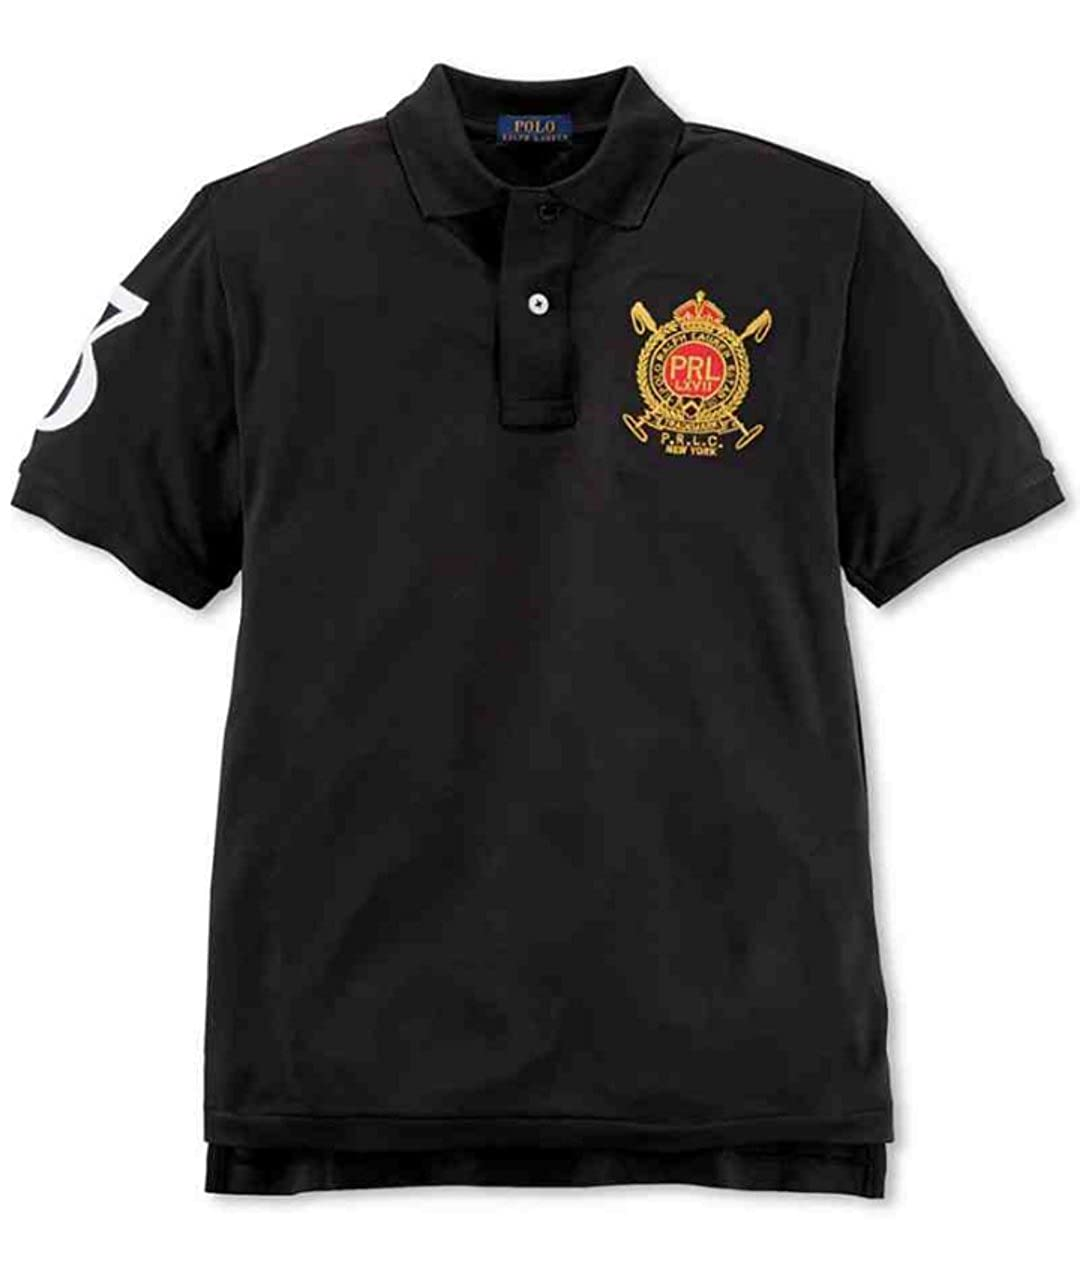 Ralph Lauren Boys Crested Black Polo Shirt 2 2T